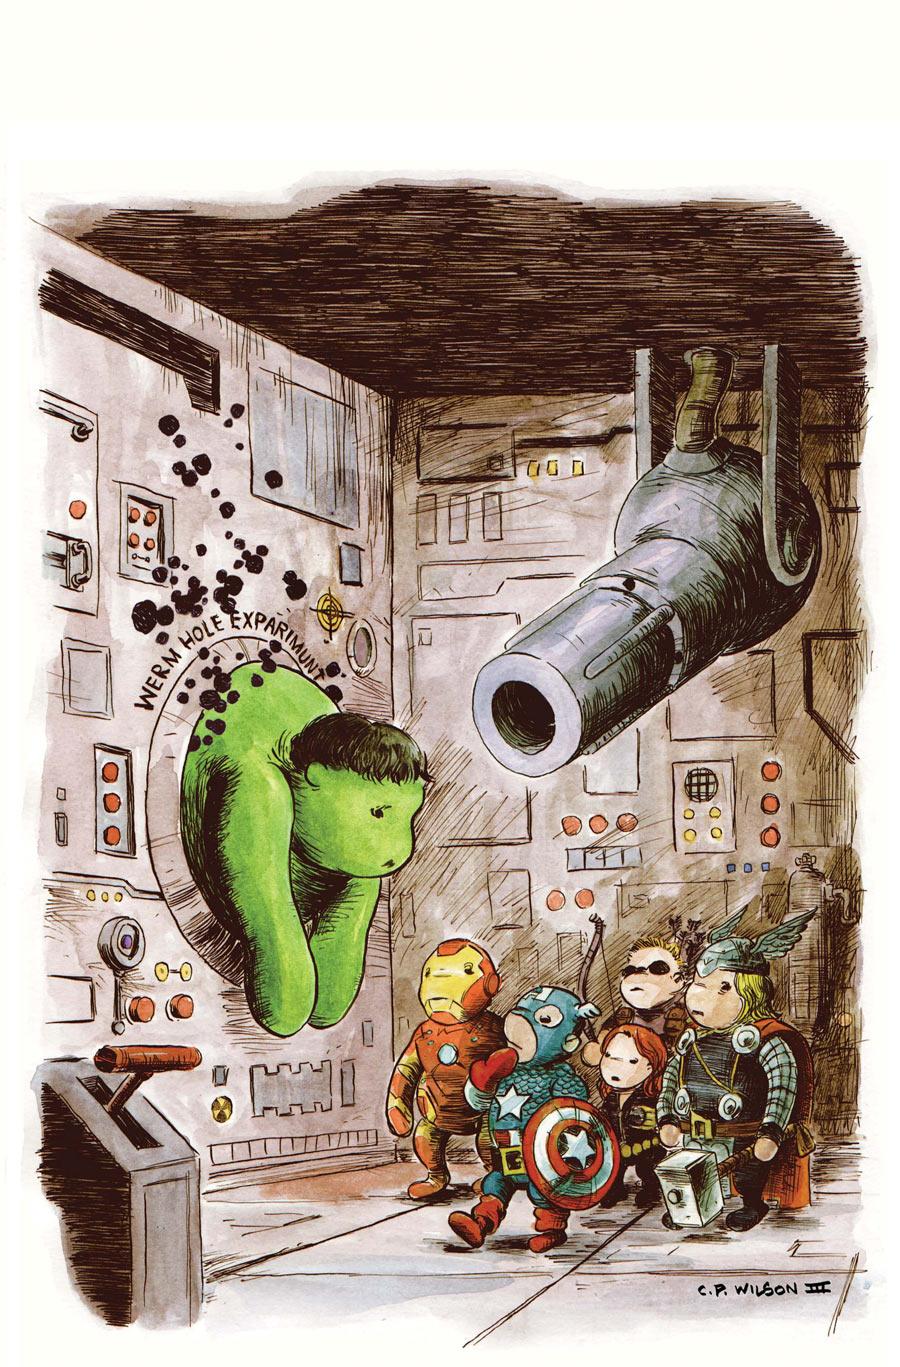 Incredible Hulk #7 - Avengers Art Appreciation Variant By Charles Paul Wilson Iii